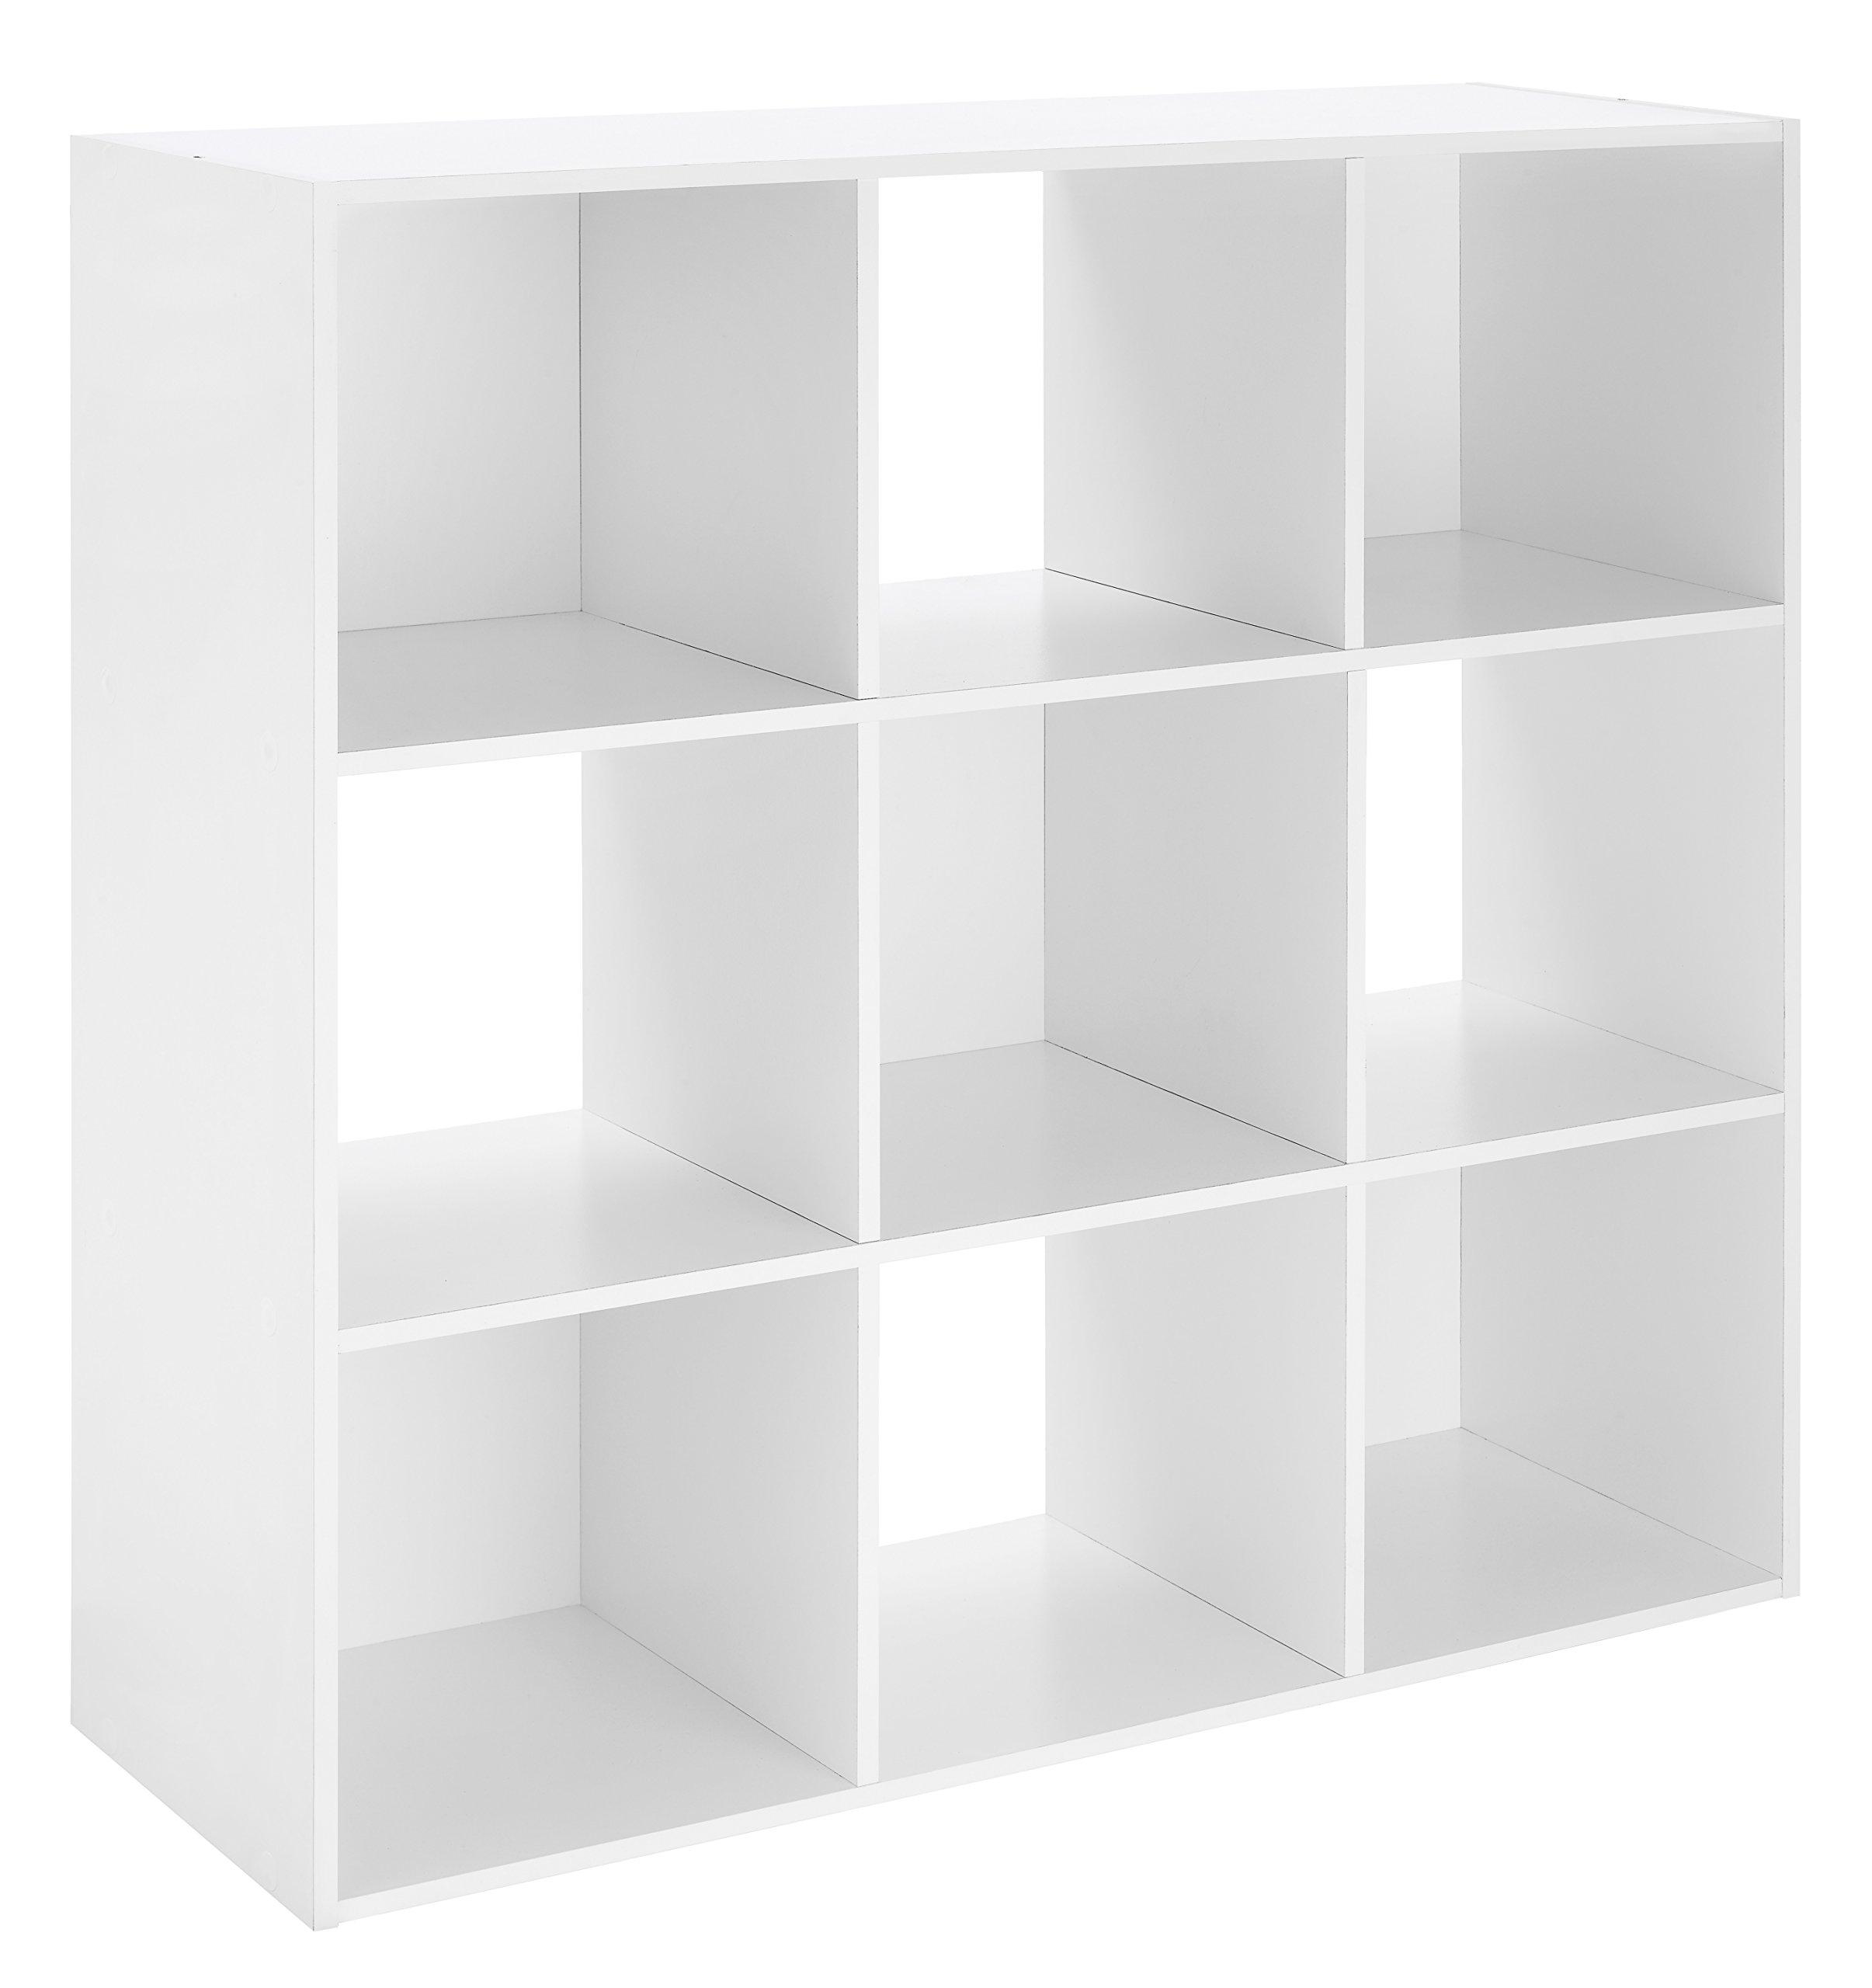 Whitmor Wood Storage Organizer, 9 Cube, White by Whitmor